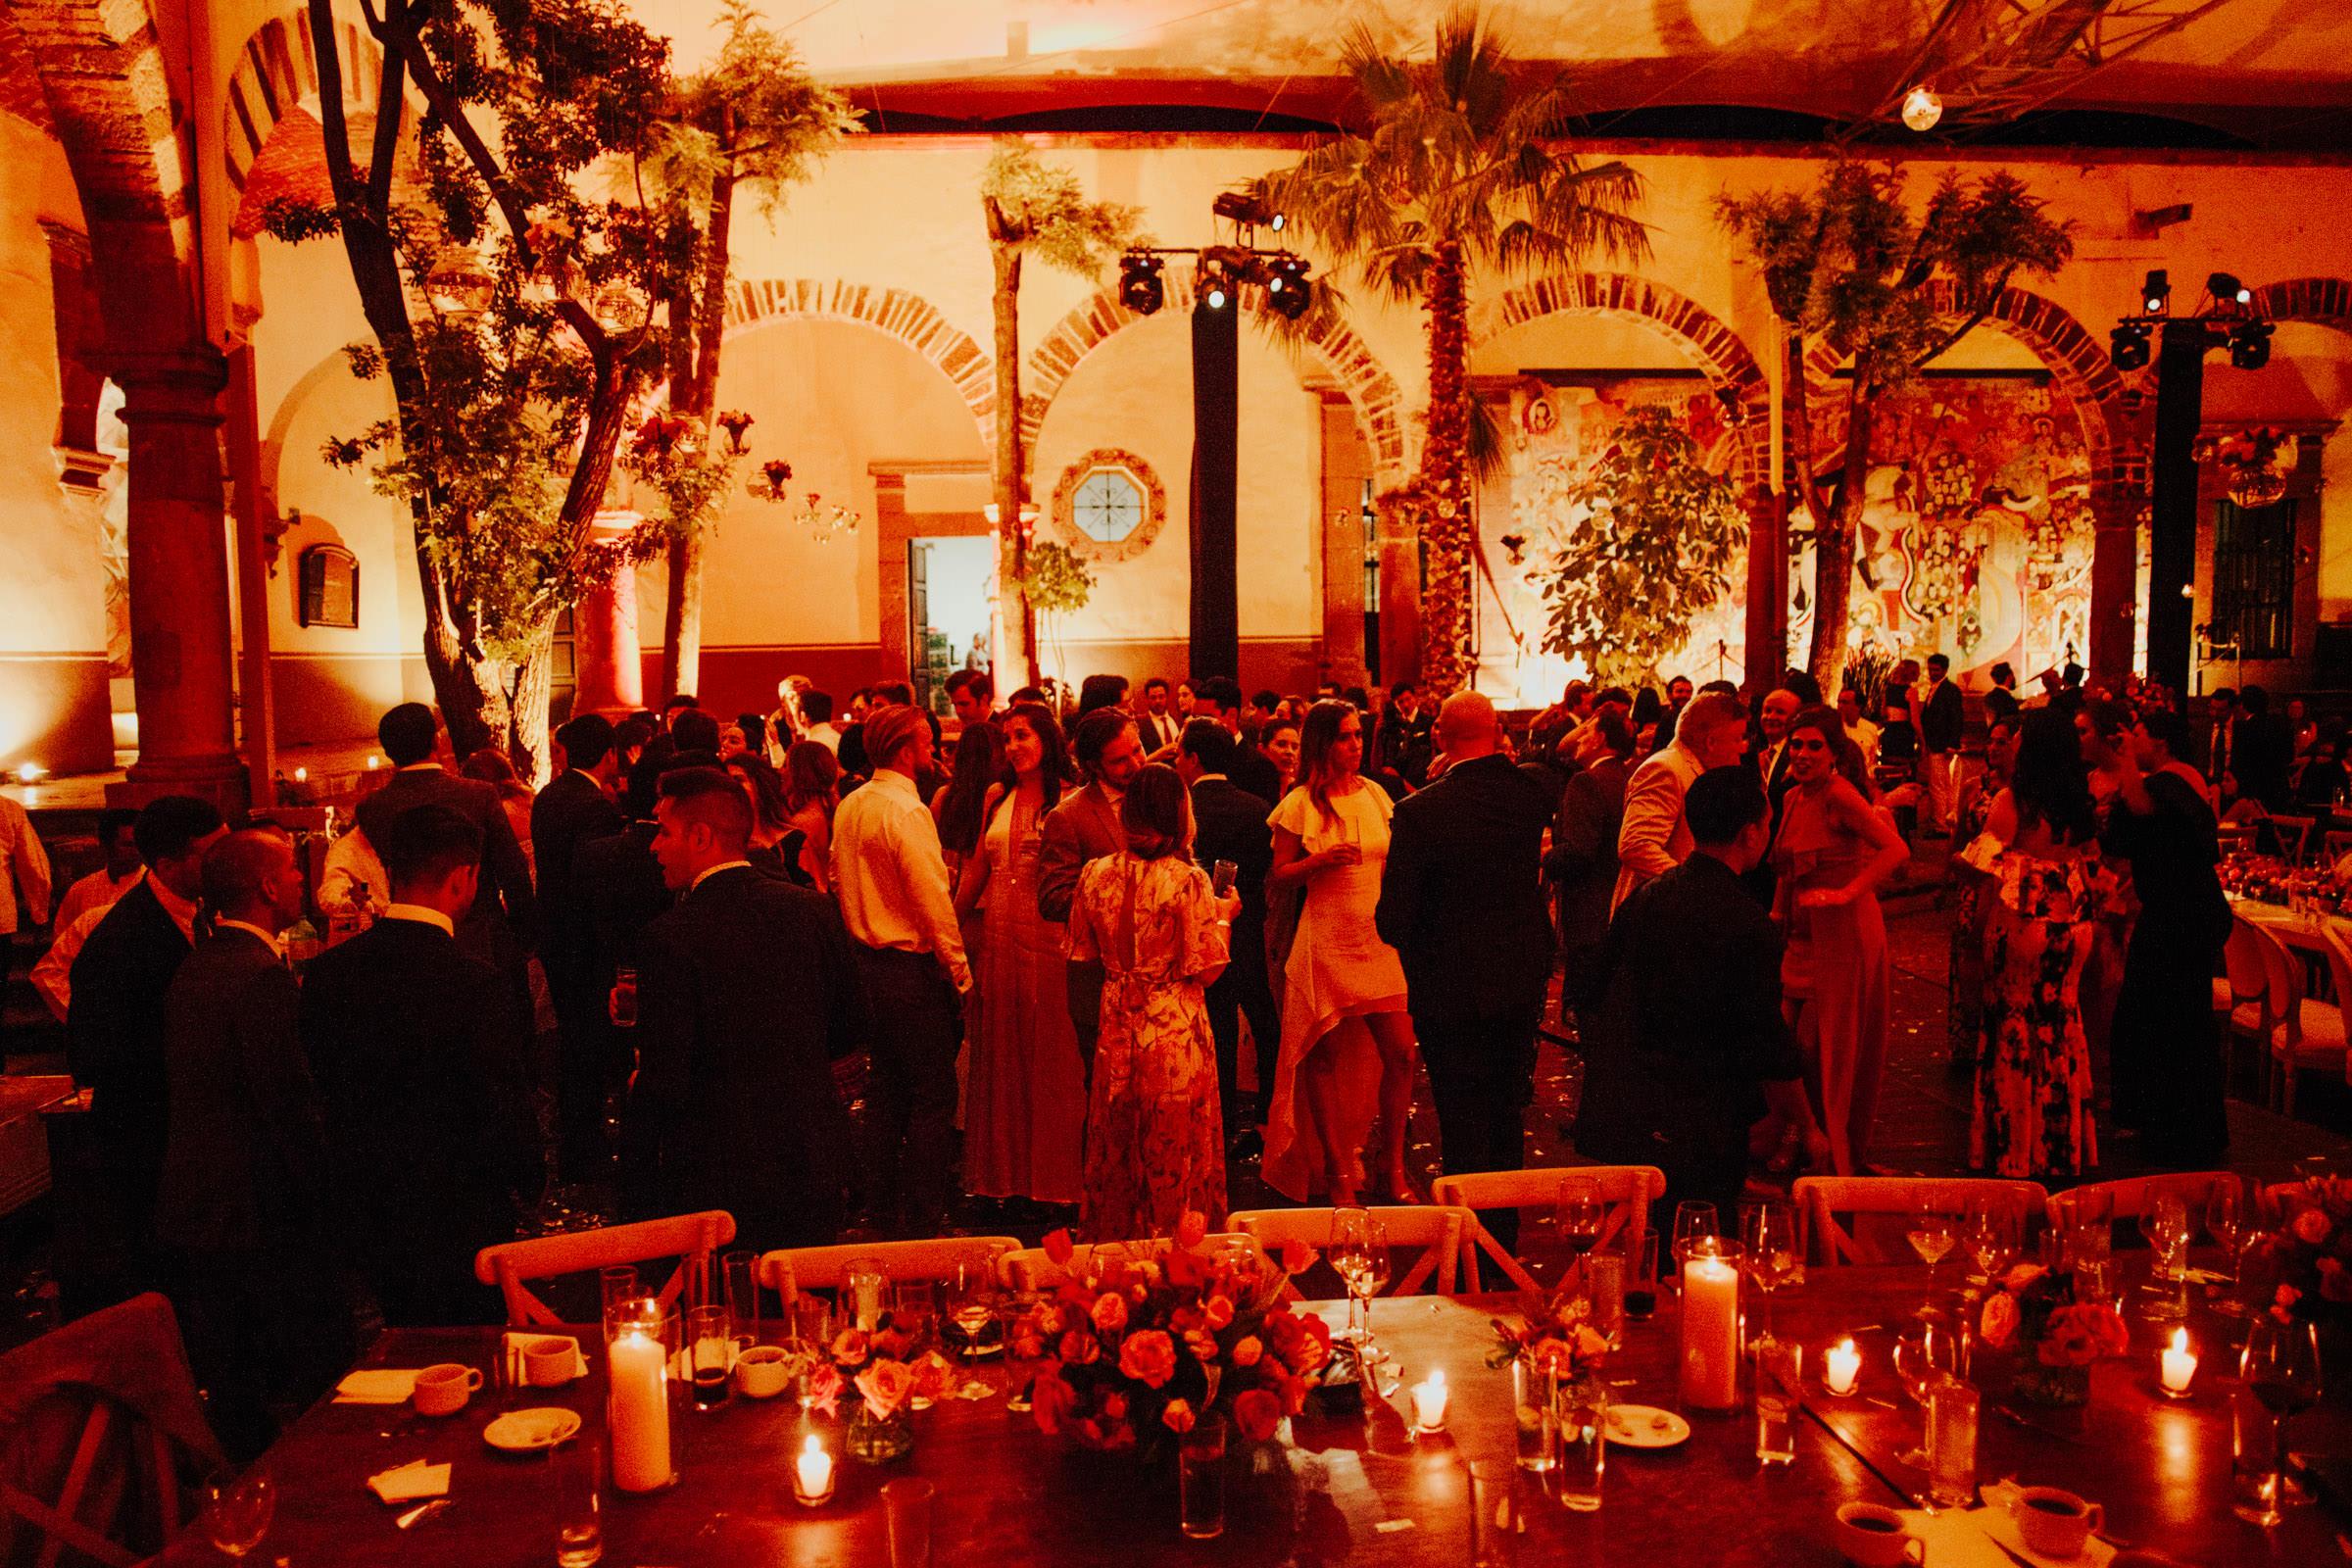 San-Miguel-de-Allende-Wedding-Photography-Parroquia-Instituto-Boda-Fotografia-Fer-Sergio-Pierce-Lifestyle-Photography0064.JPG